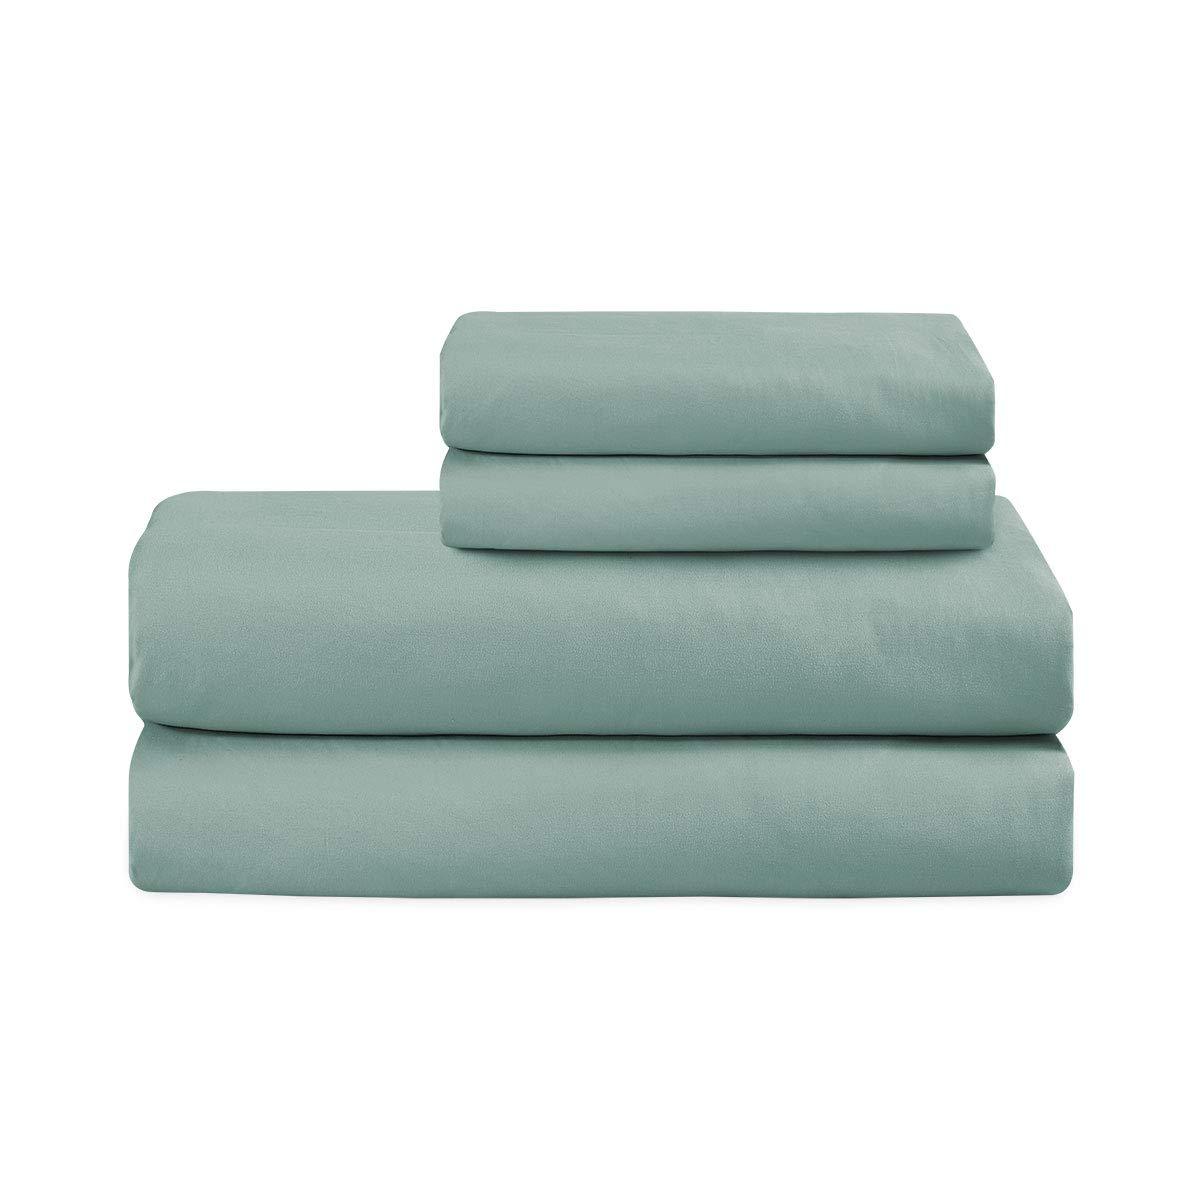 Basic Choice 床单套装 - 拉绒超细纤维 1800 超软床上用品 - 防皱、防褪色、防污 - 4 件 Spa 蓝色 两个 43195-43113